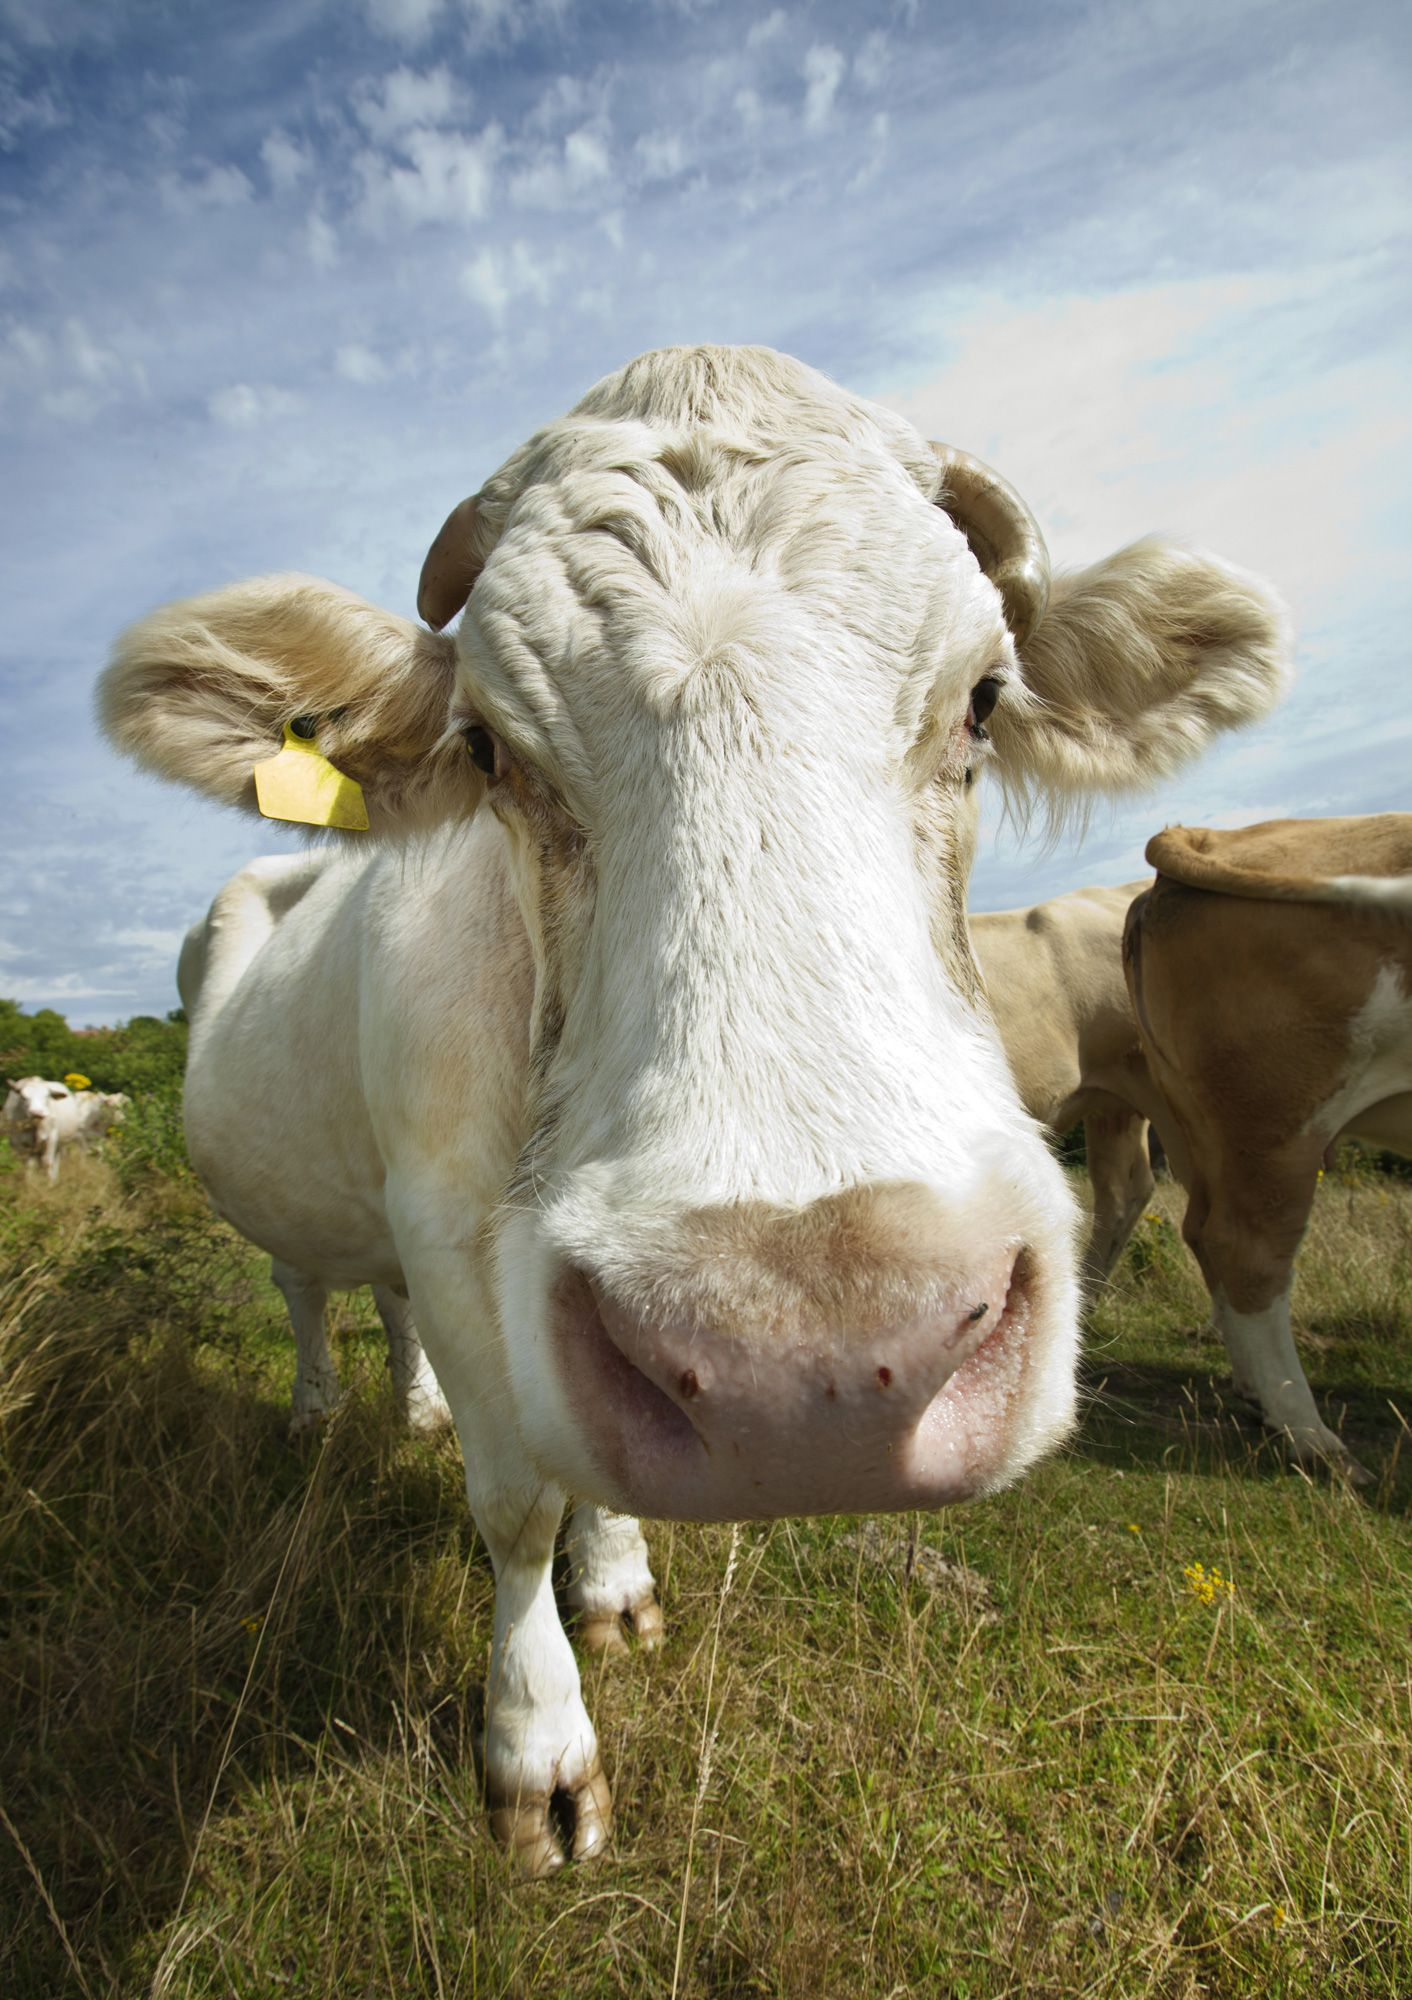 animales granja - vaca